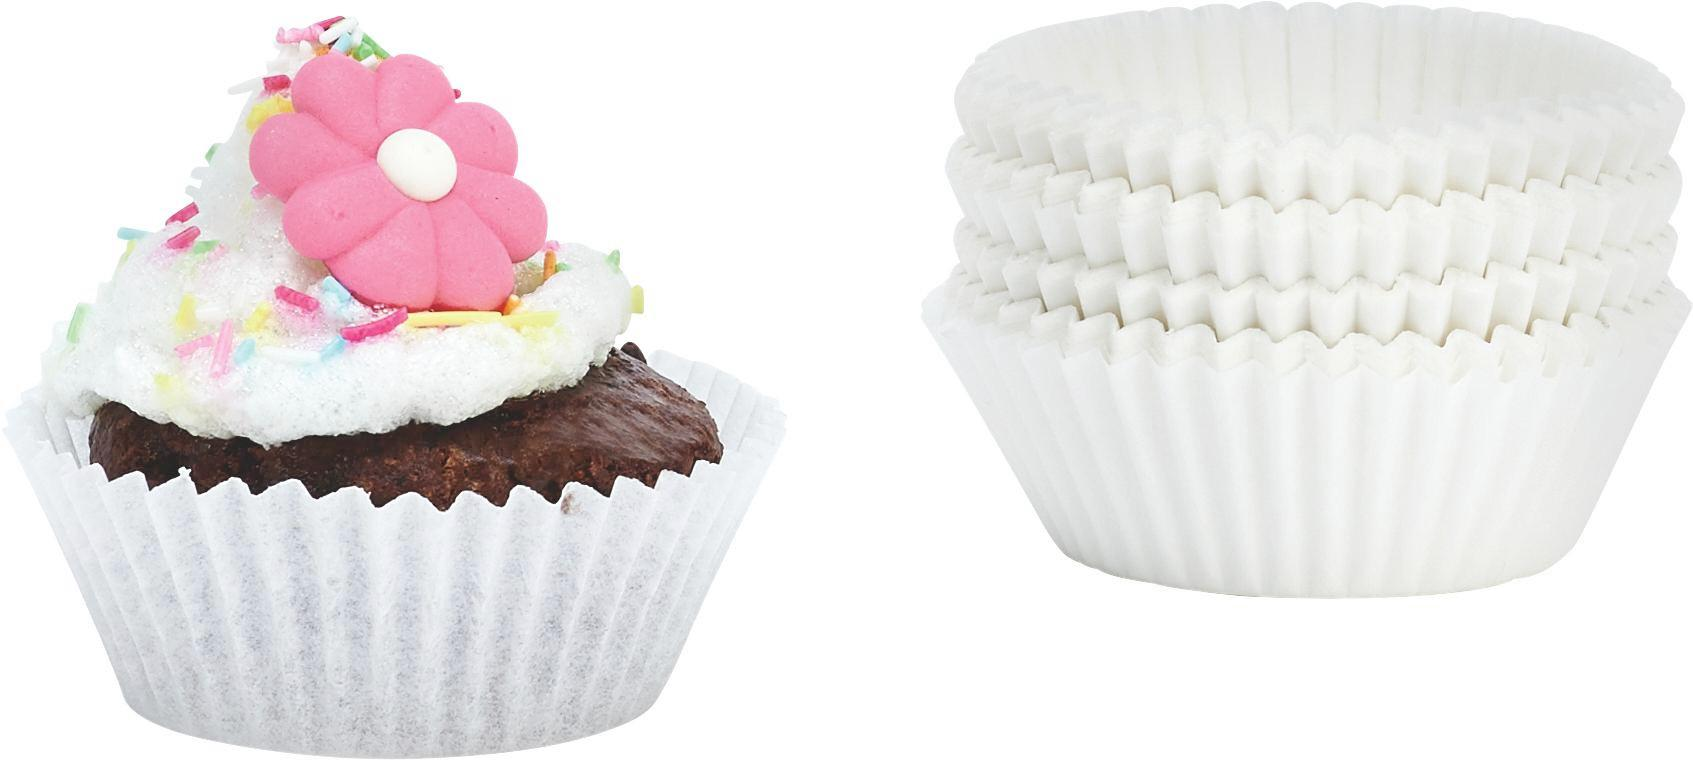 Muffin Forma Patisserie - fehér, papír (5cm) - MÖMAX modern living